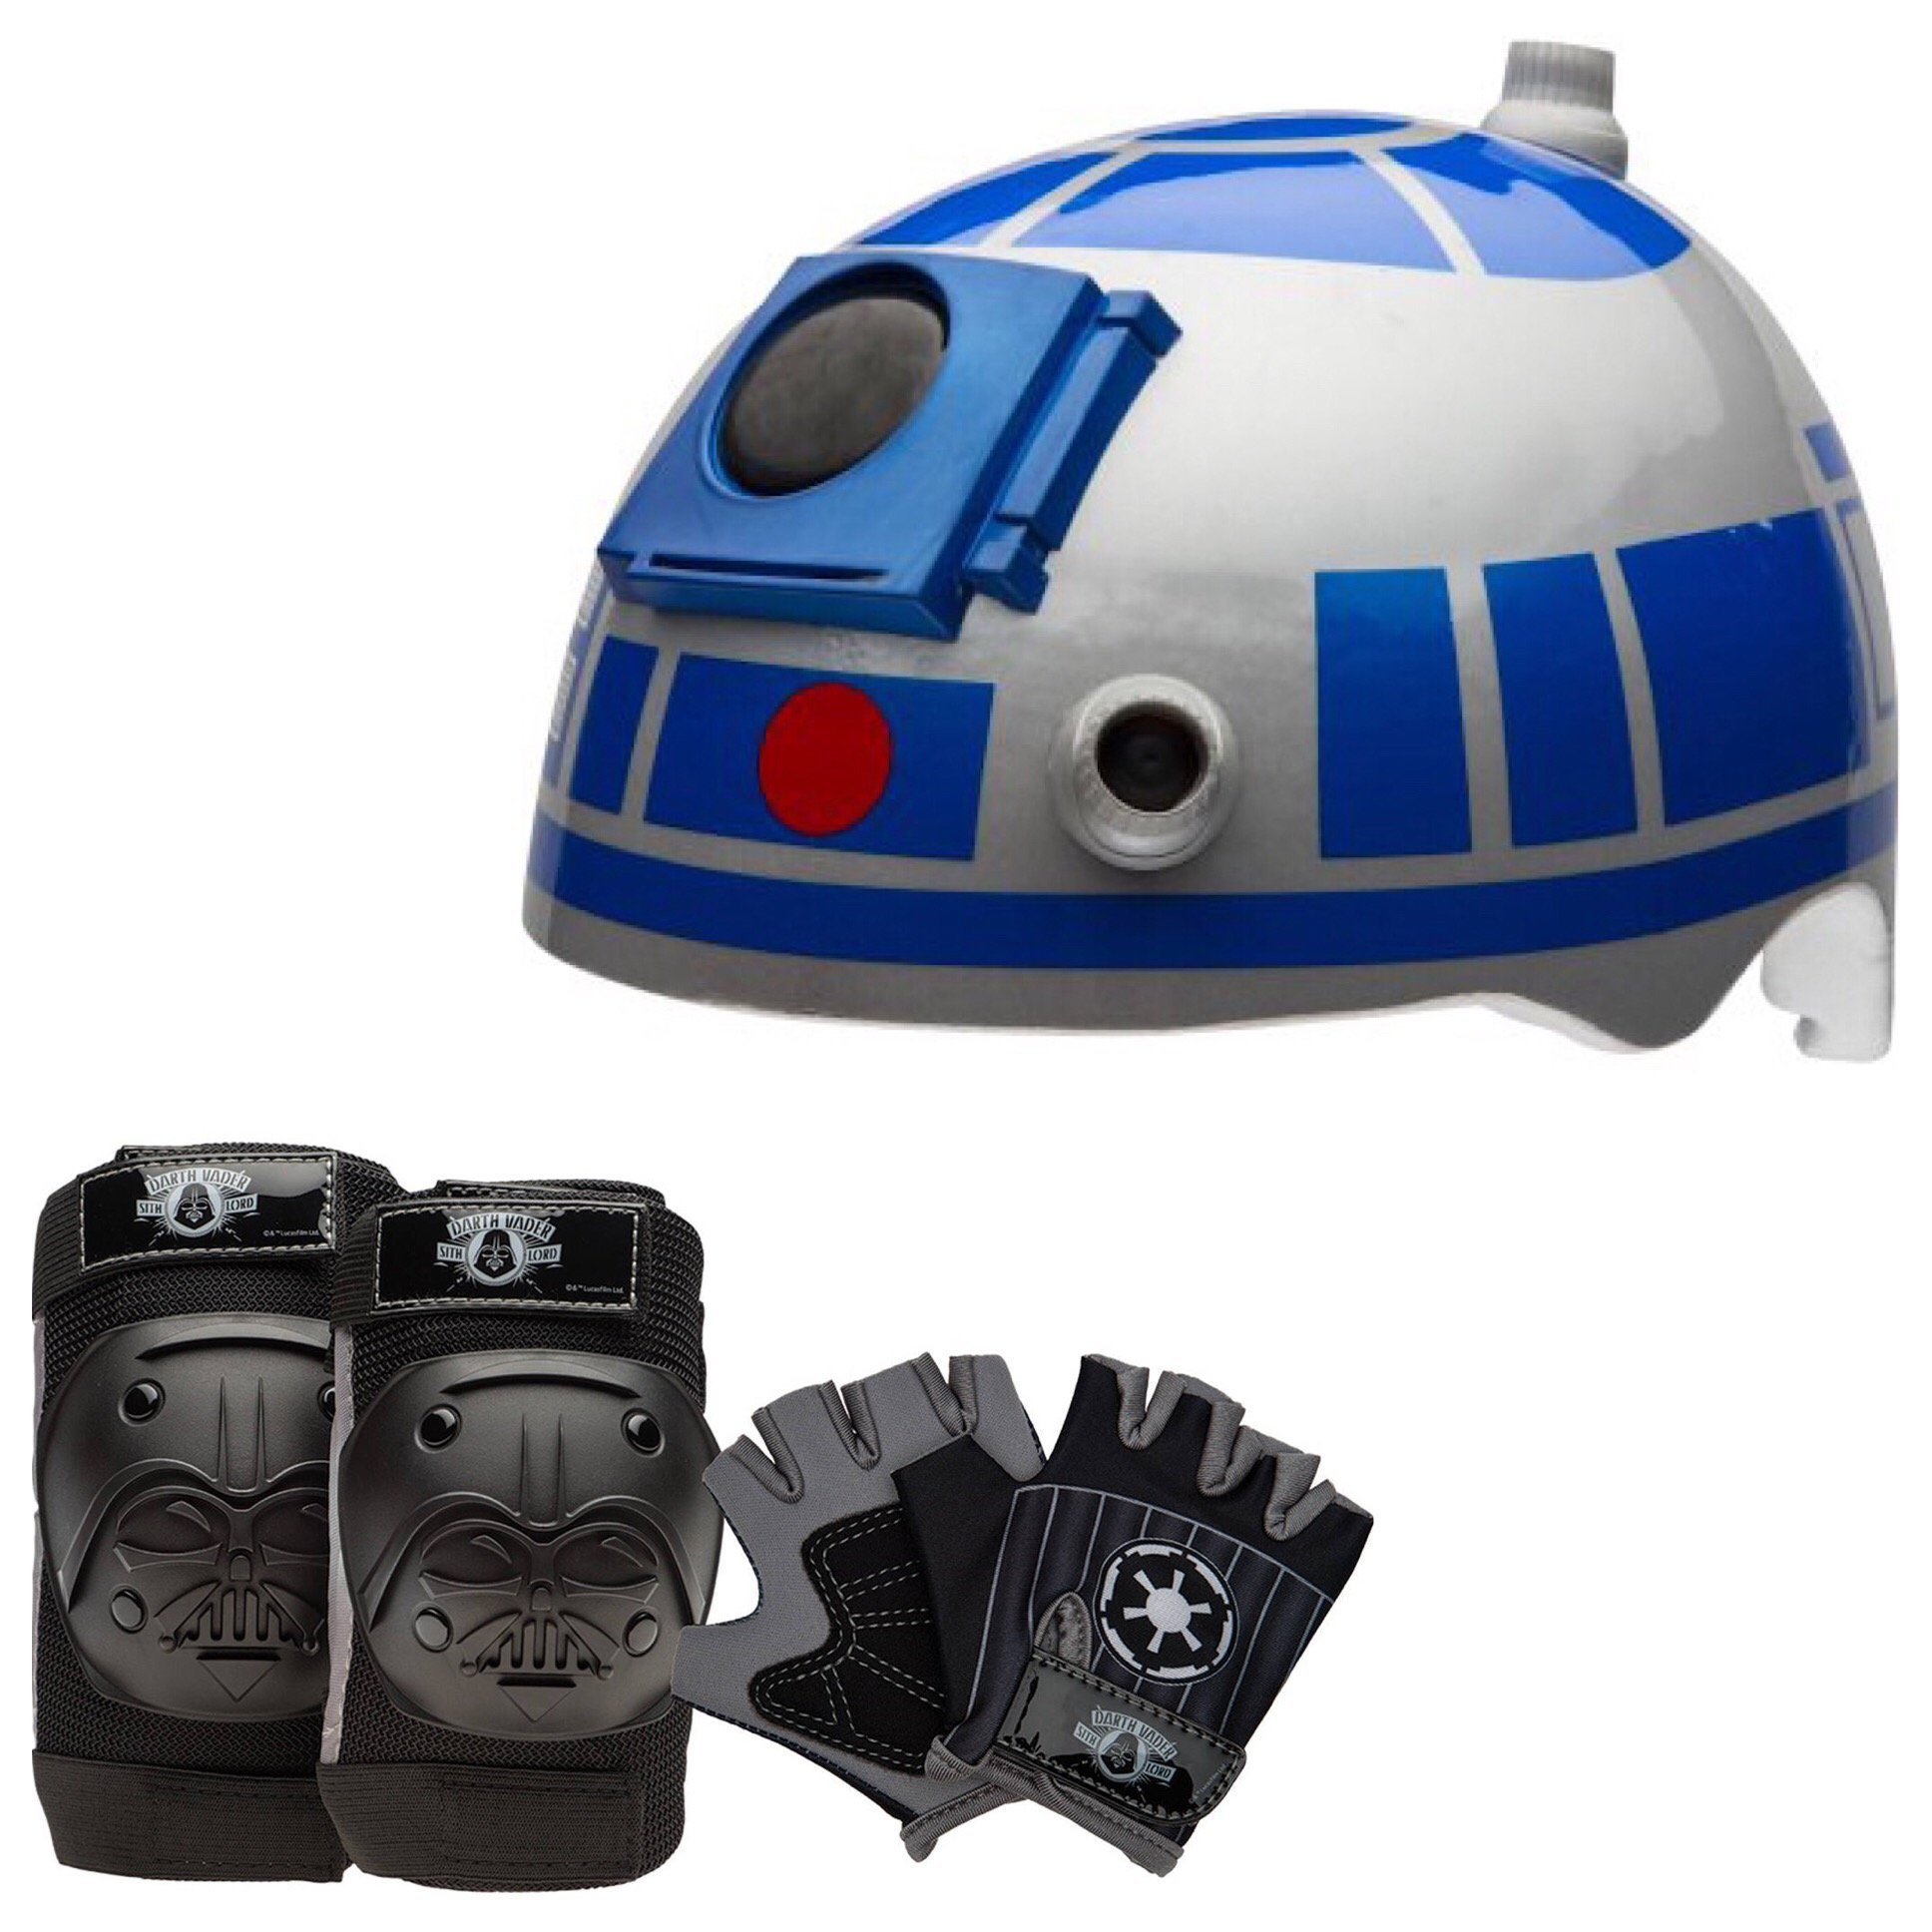 Star Wars R2-D2 Skate / Bike Helmet with Darth Vader Pads and Gloves - 7 Piece Set